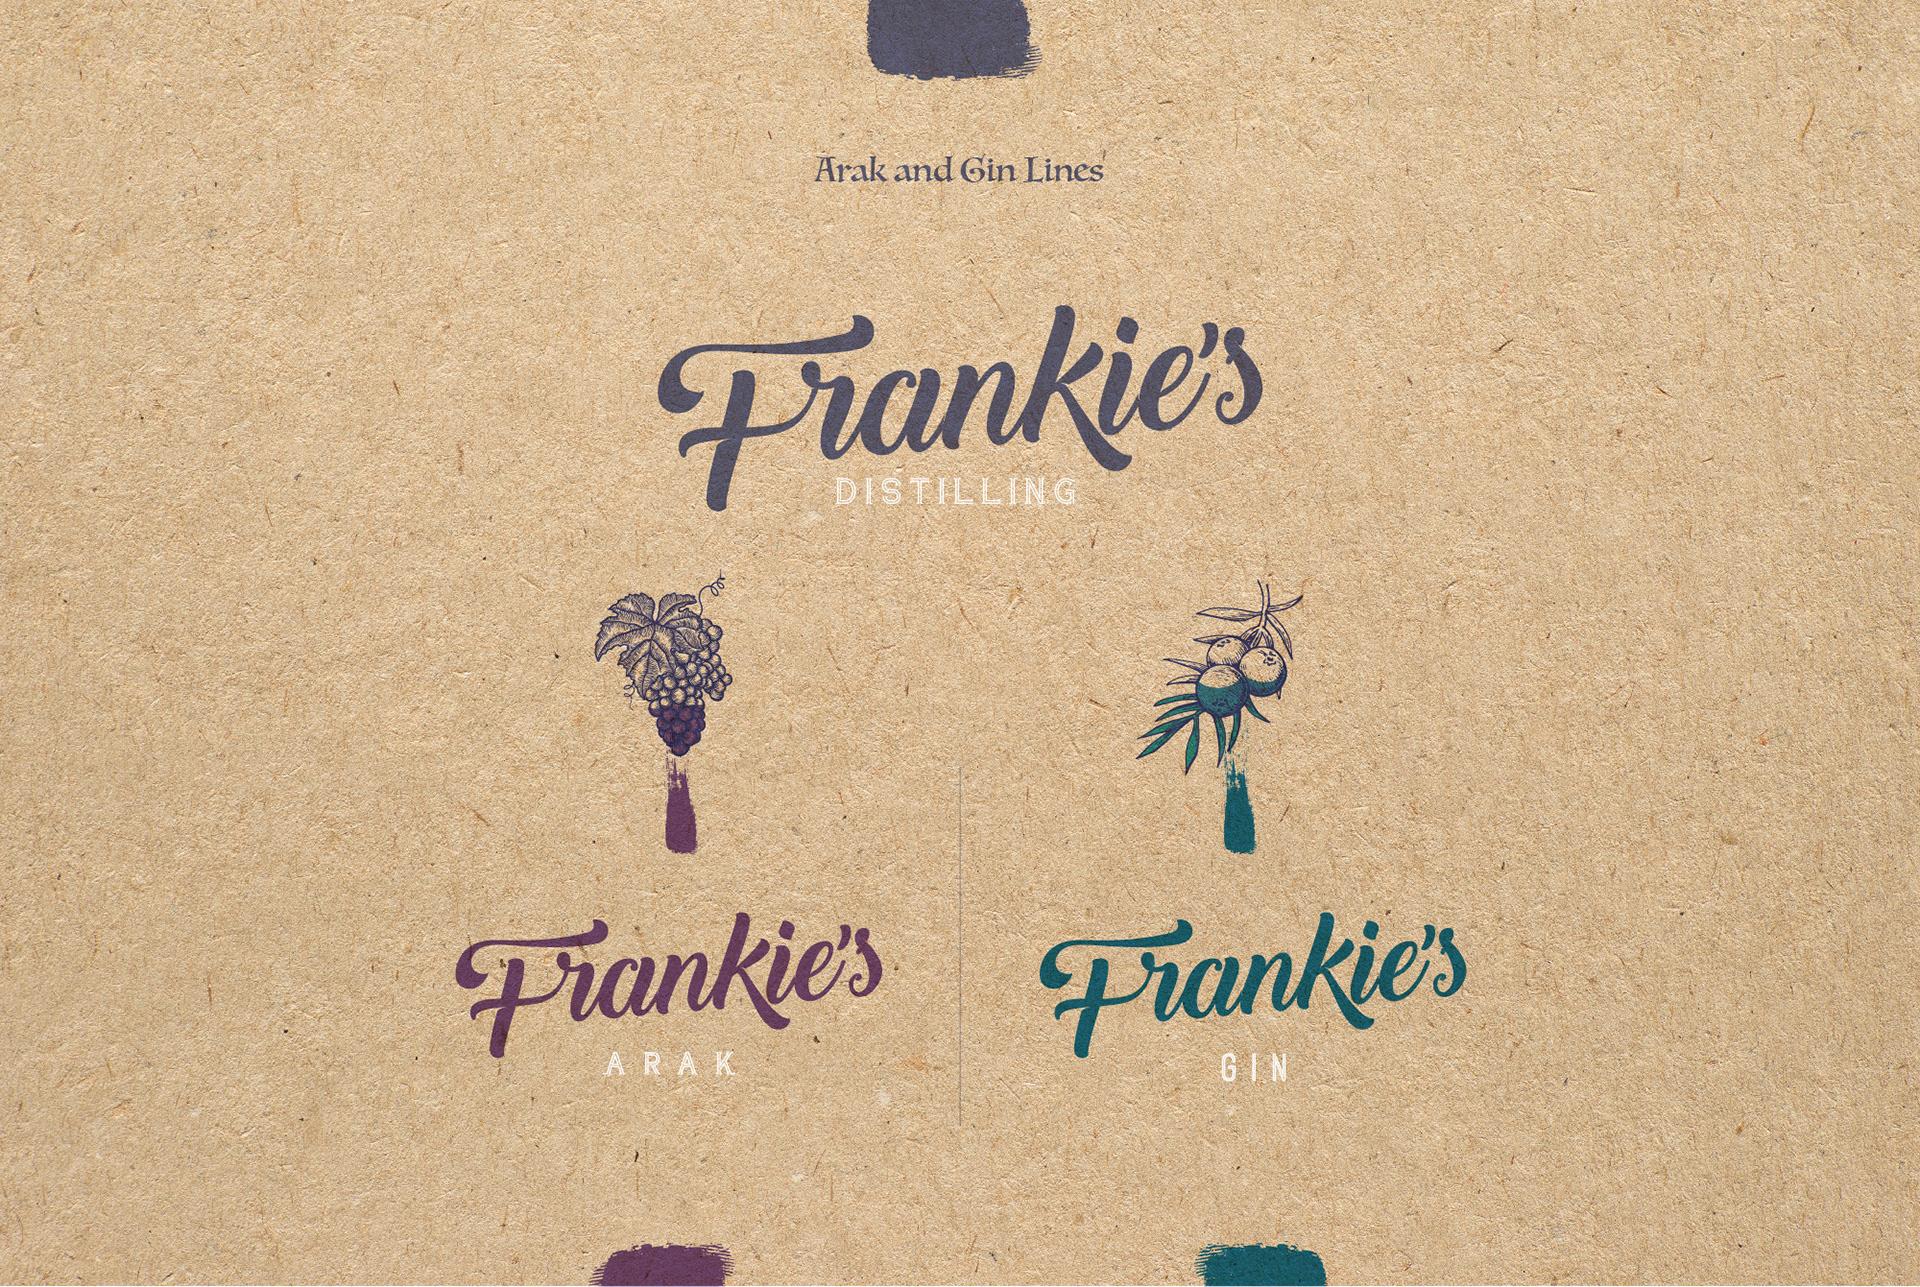 Ahmad Ajlouny - Frankie\'s Identity and Labels